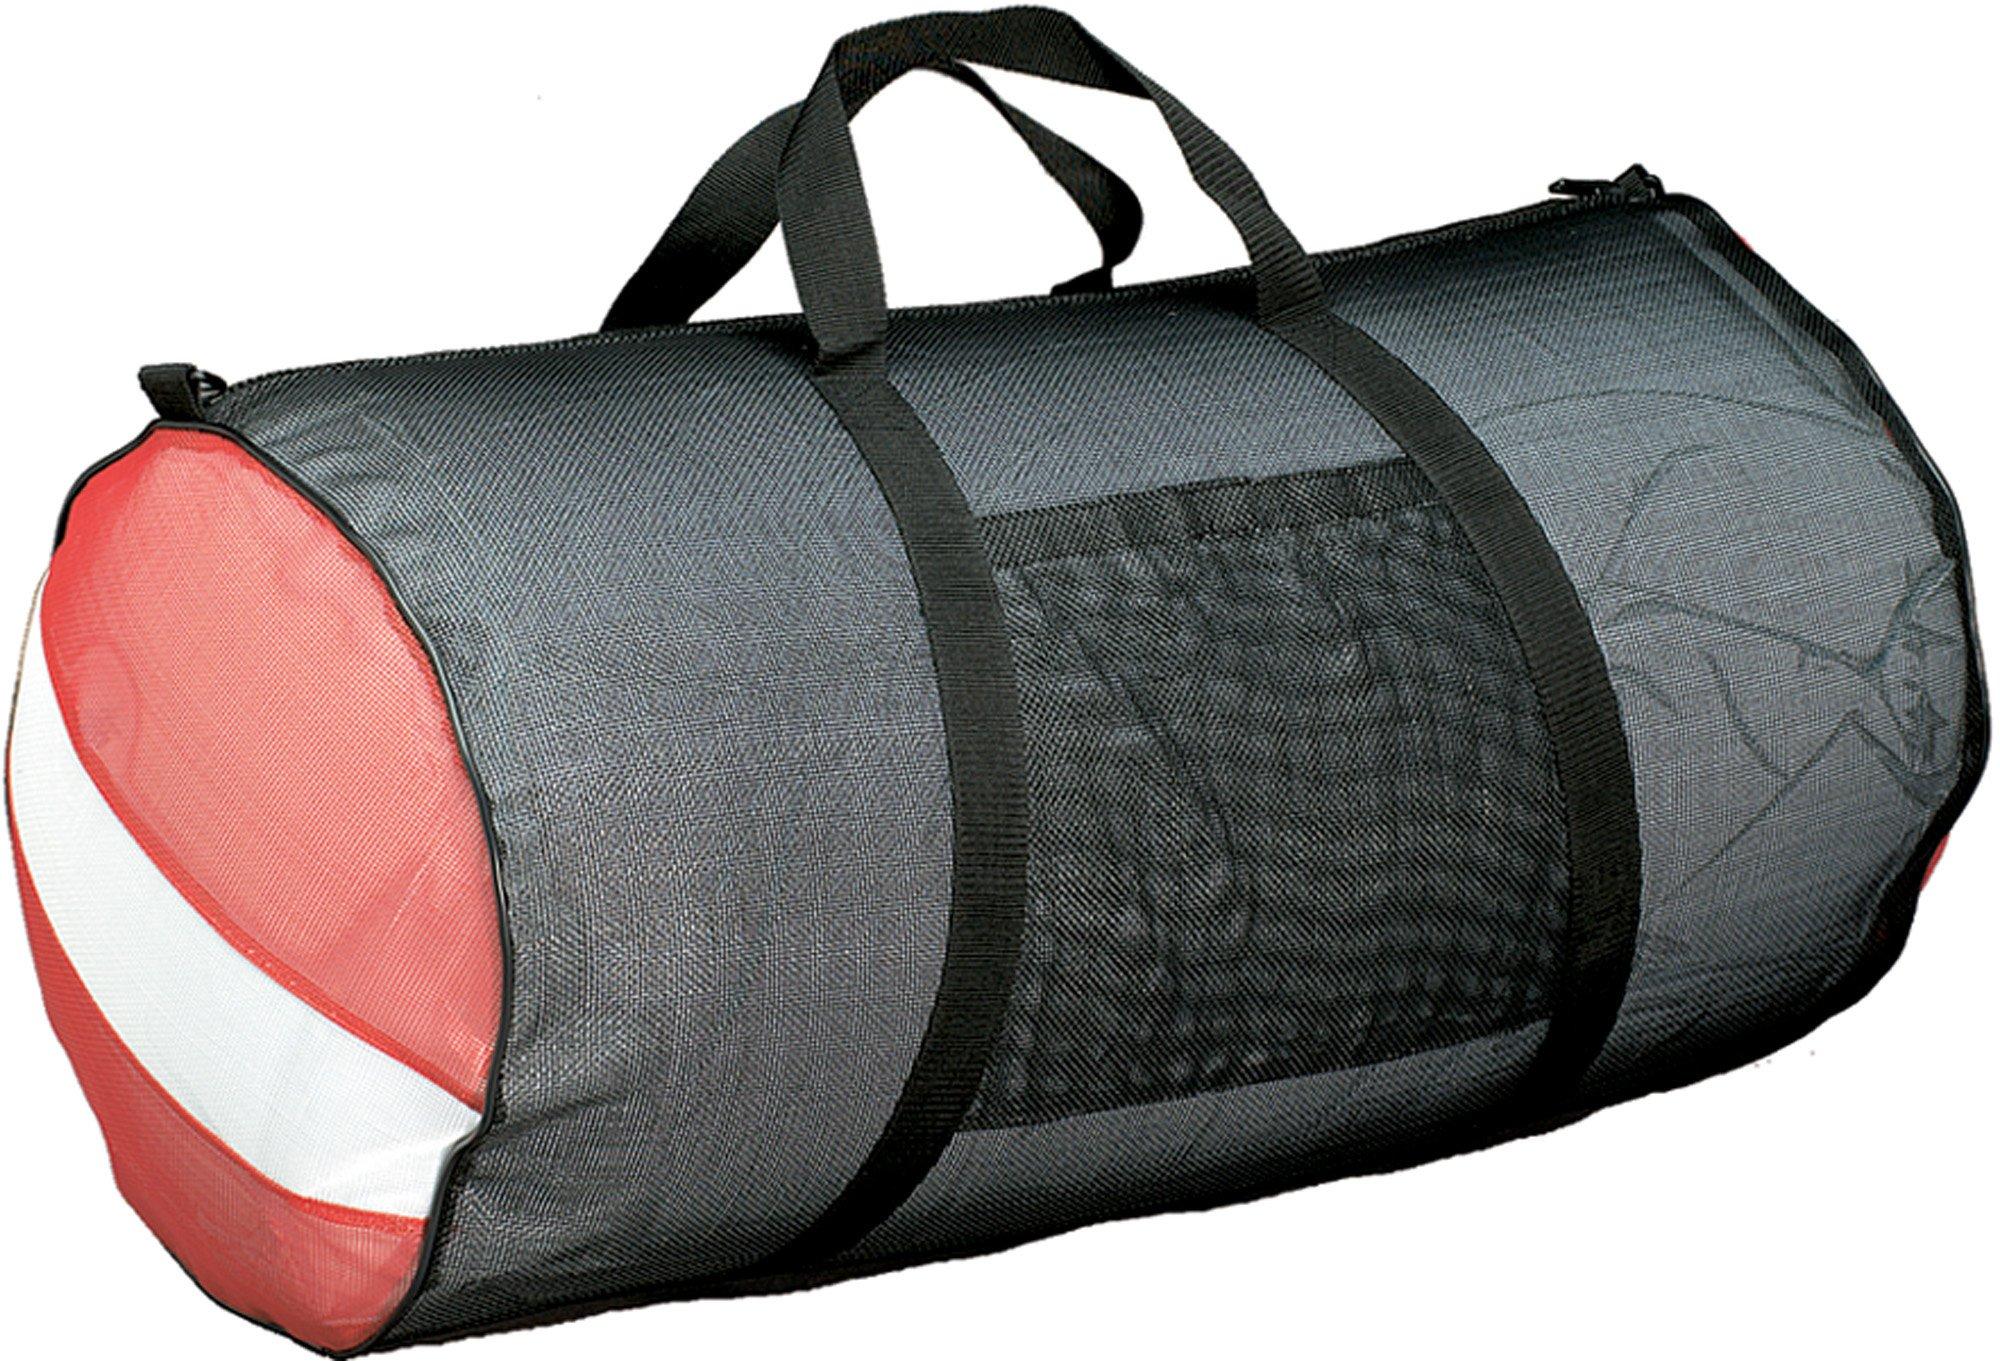 Heavy-Duty Mesh Diver's Bag